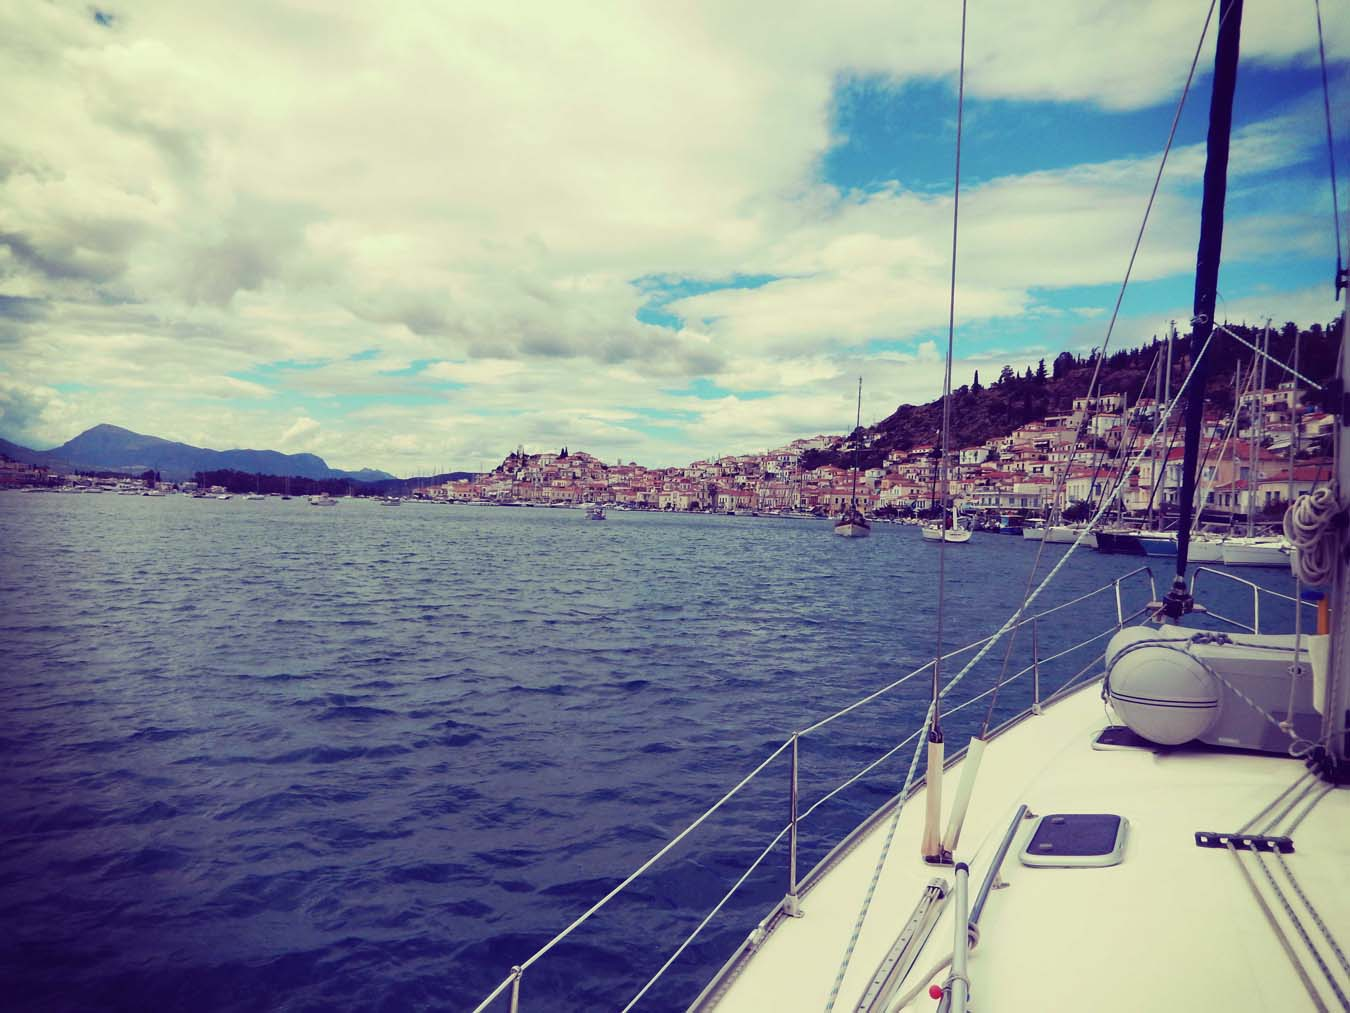 Sailing in Greece. Marina of Poros.